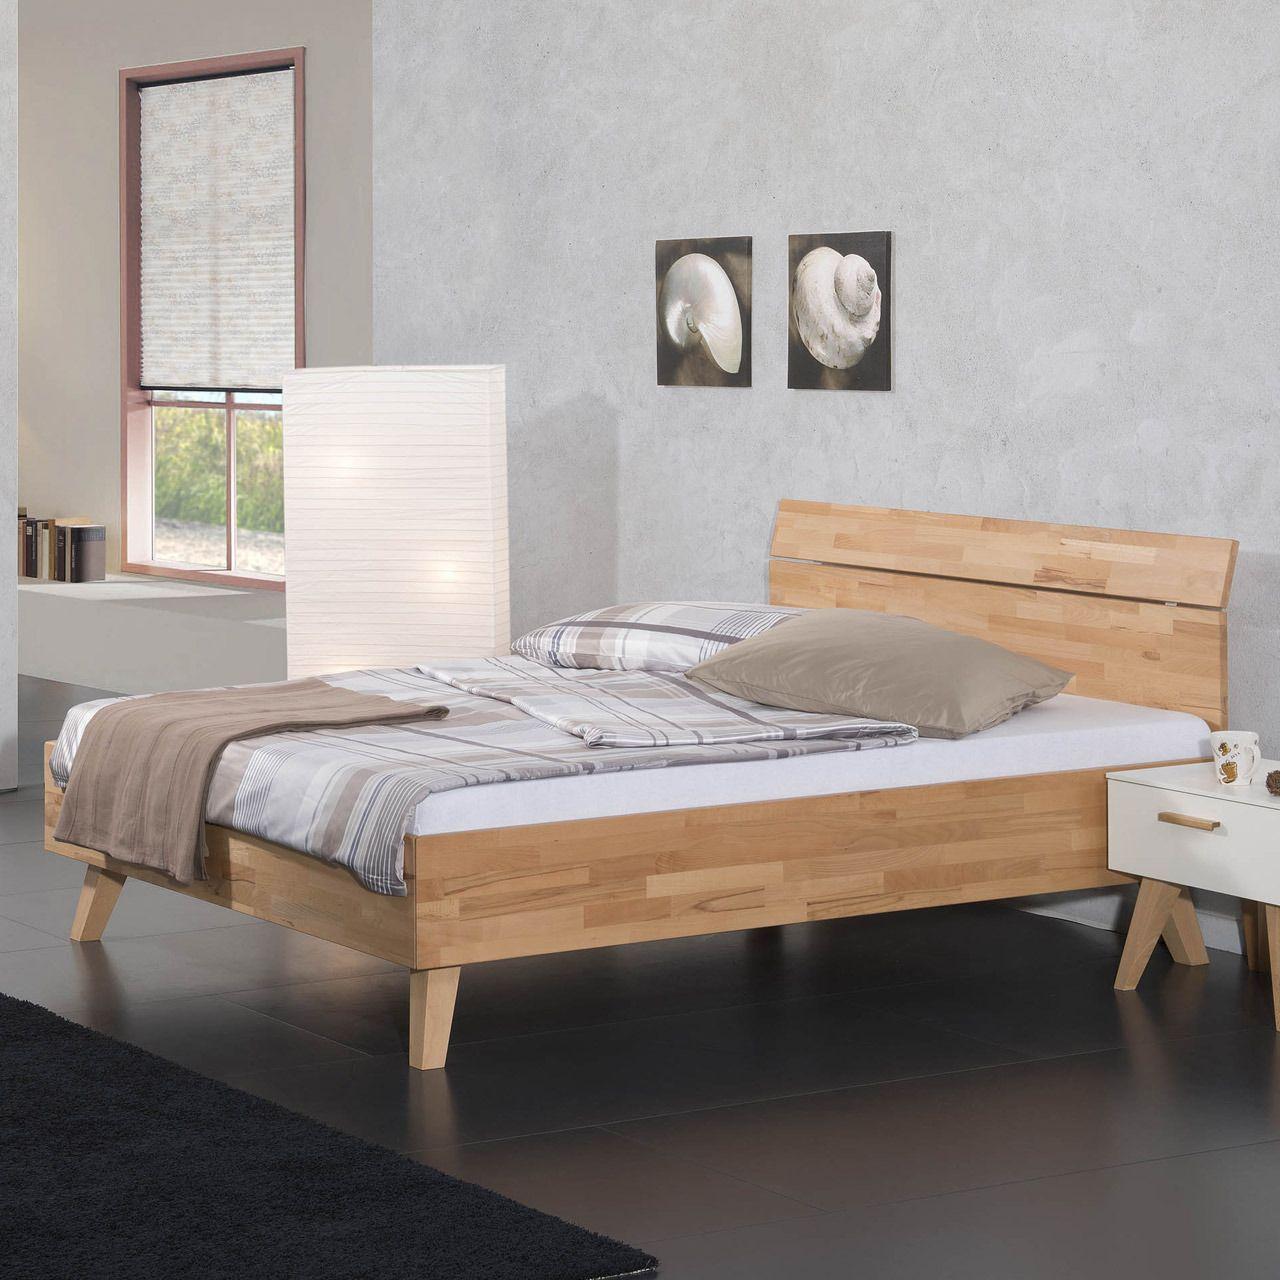 Modular Misano Mileto 2 In 2020 Massivholzbett Bett Ideen Kleiner Nachttisch